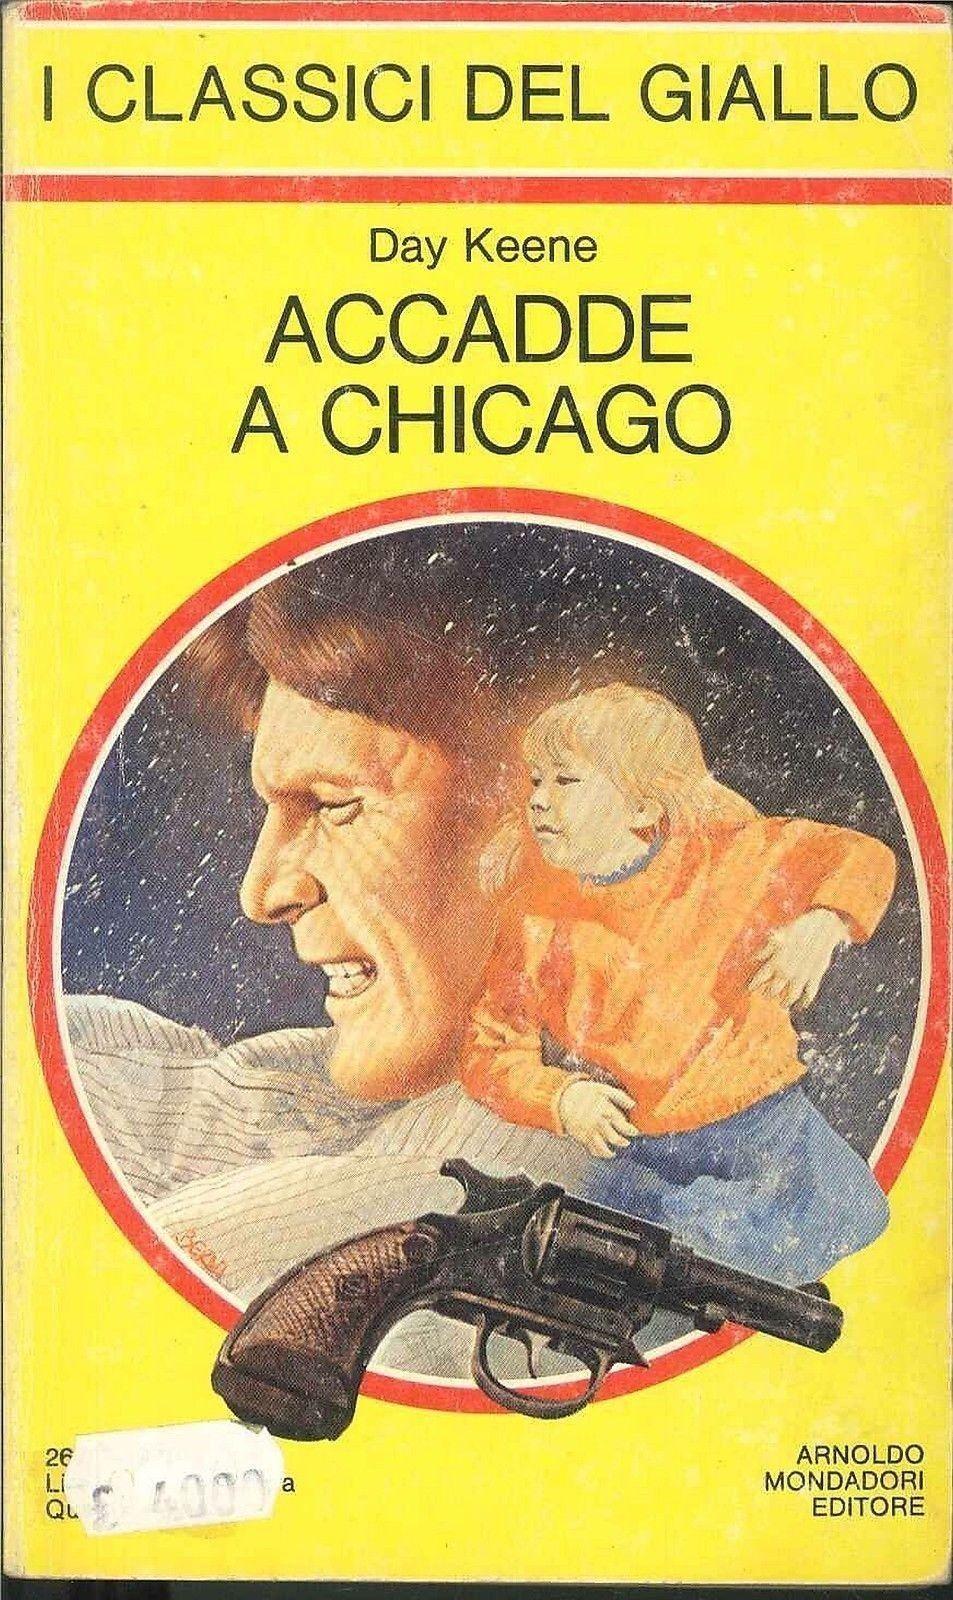 Accadde a Chicago